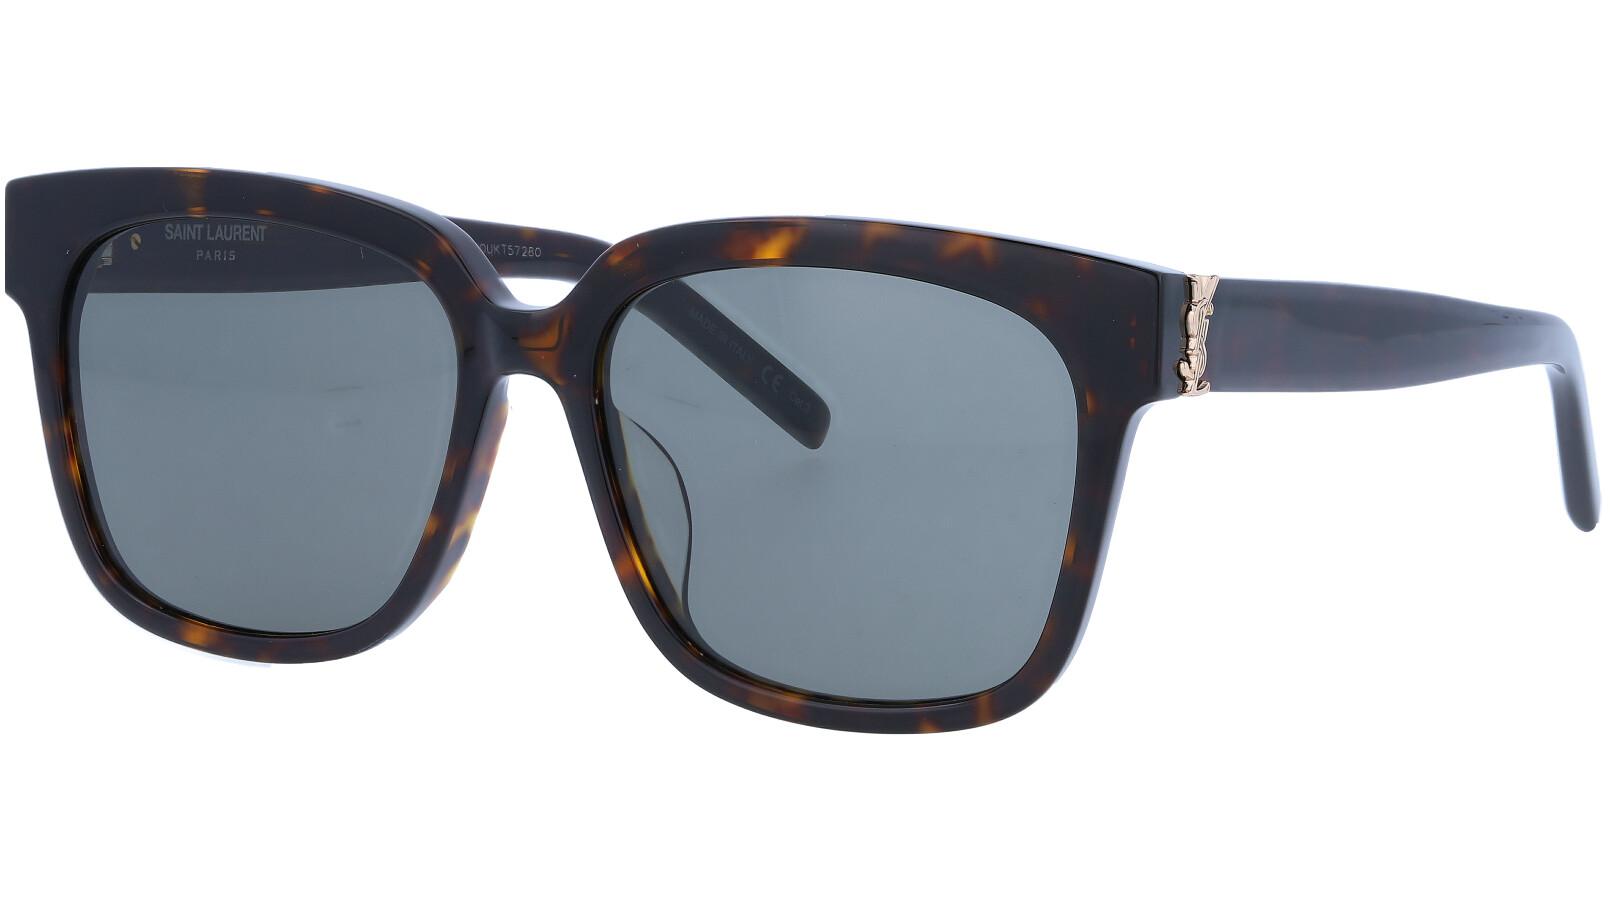 SAINT LAURENT SLM40F 003 55 BLACK Sunglasses